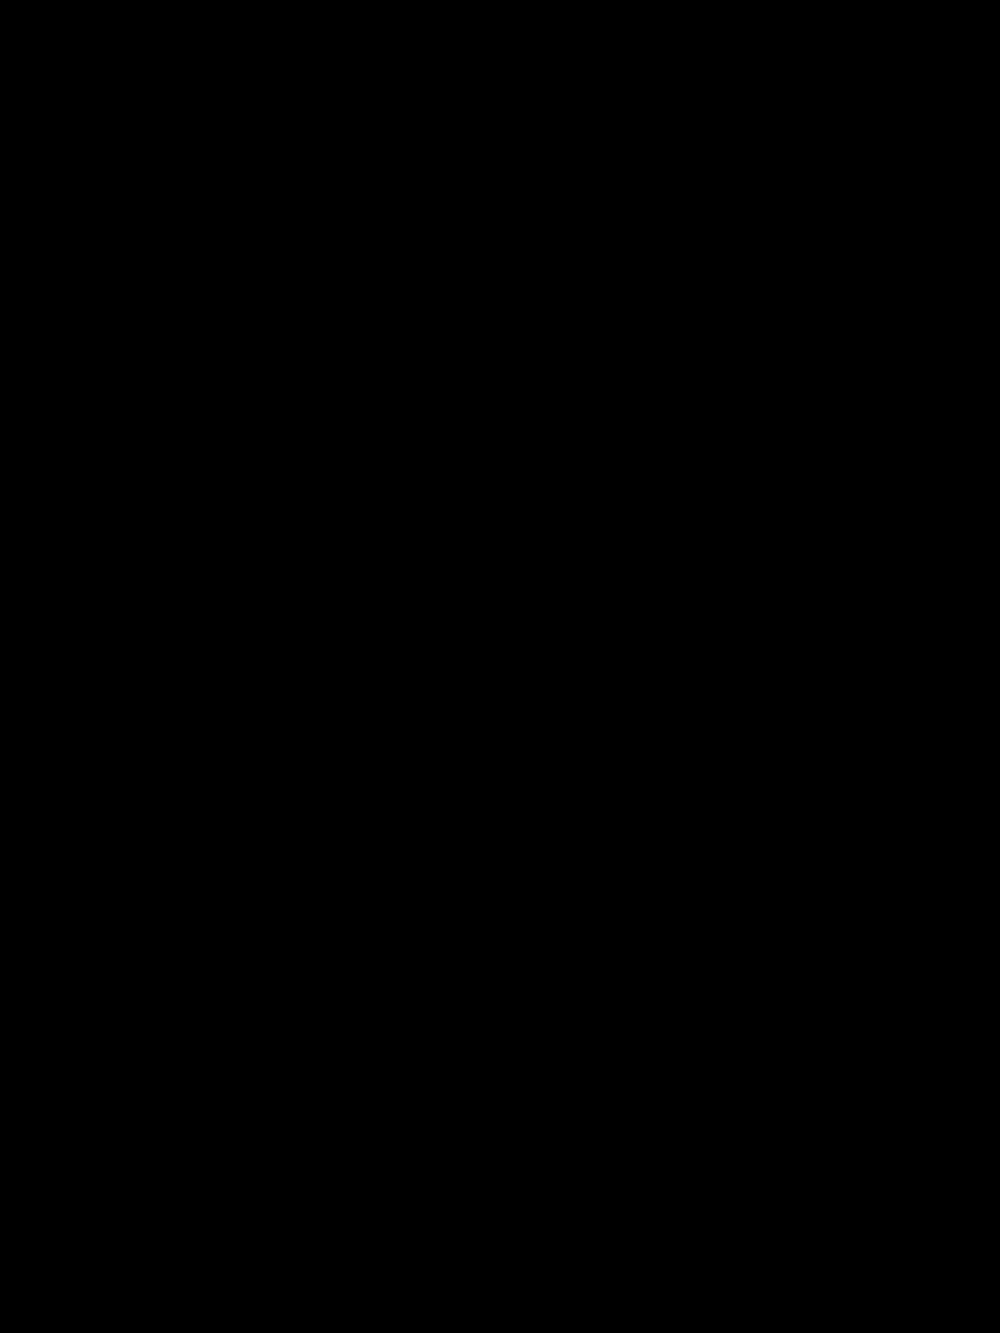 0000_black.jpg